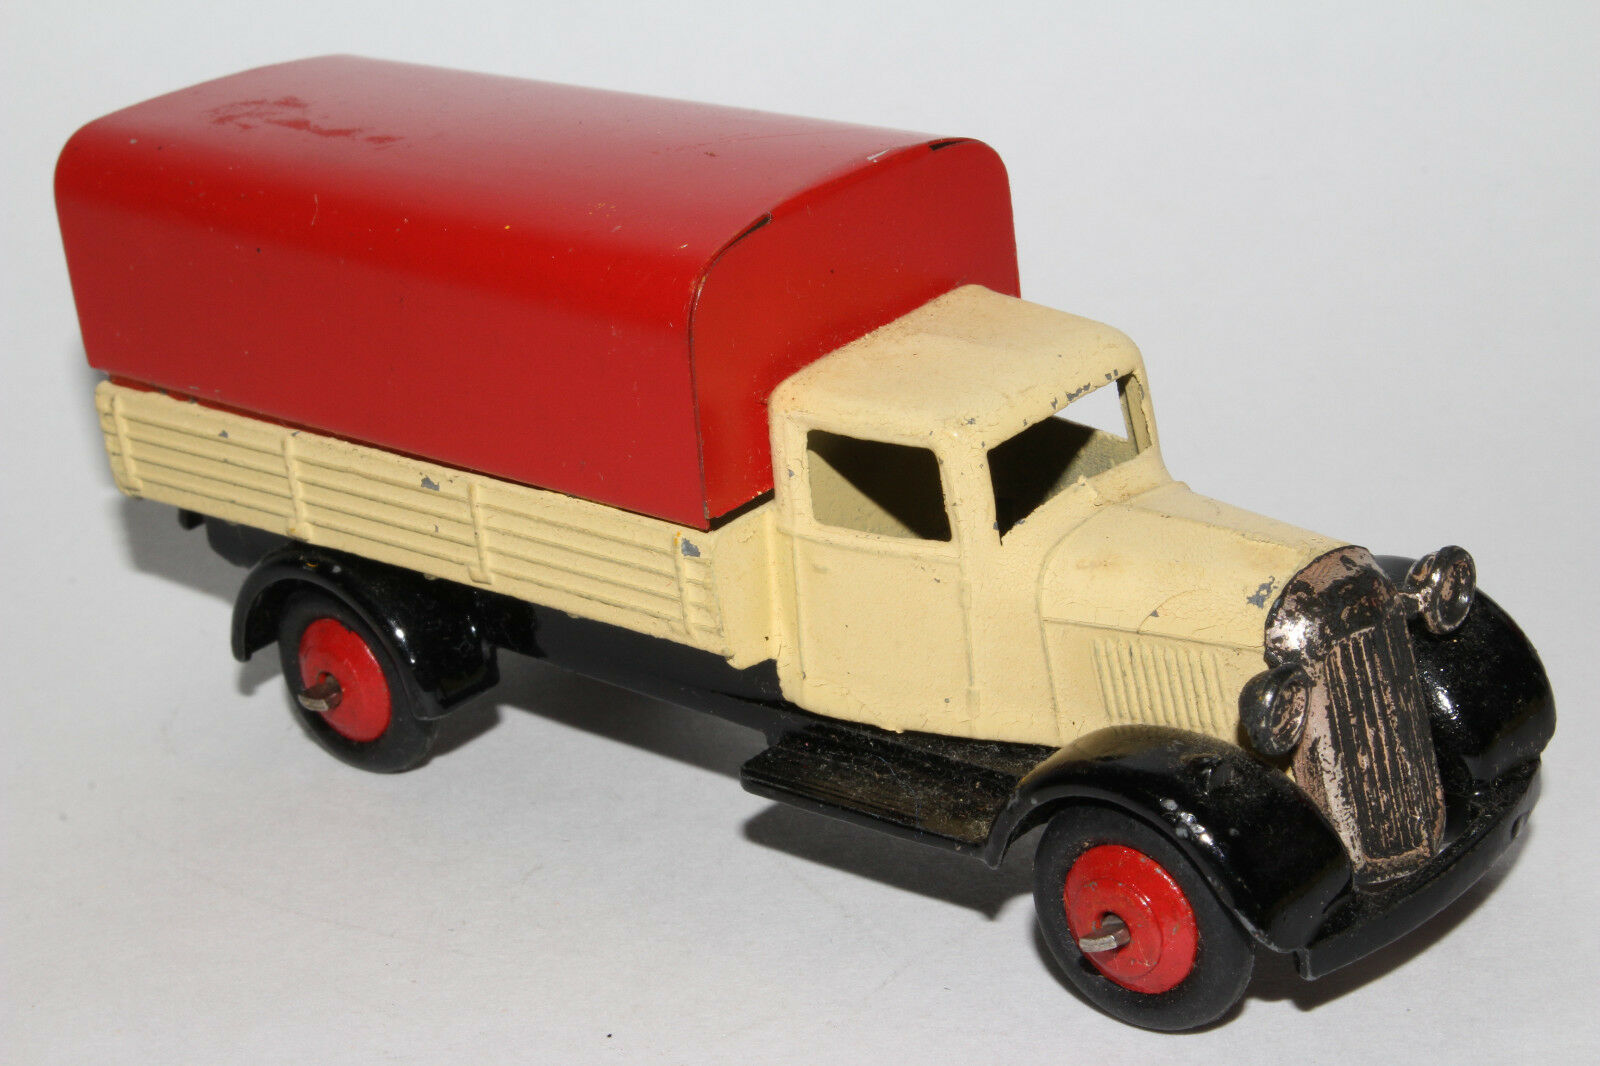 594ms Dinky 25b  Couvert Wagon Camion, Agréable Original  meilleure offre